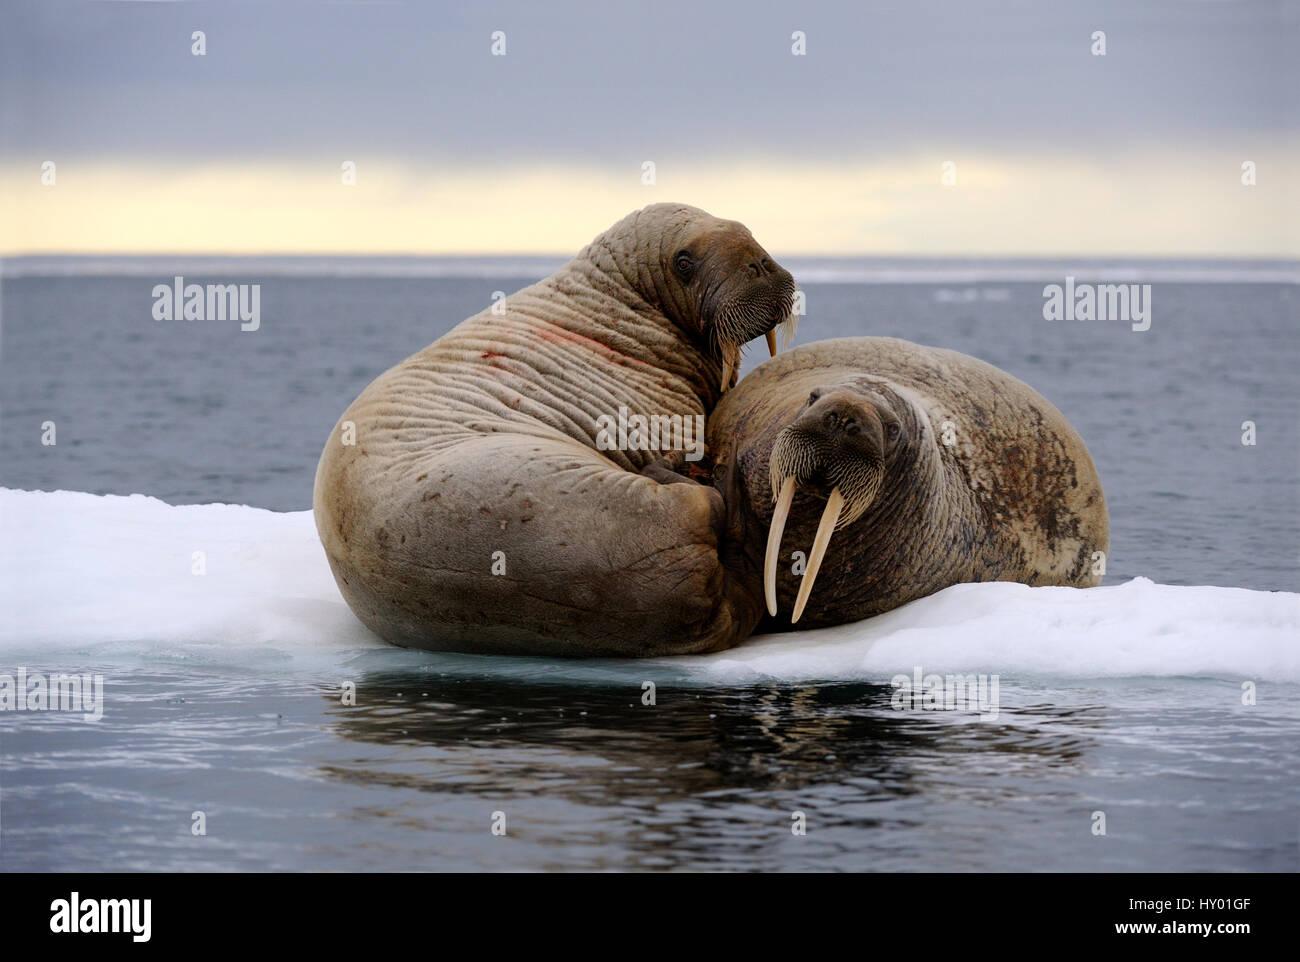 Two walrus (Odobenus rosmarus) resting on ice. Foxe Basin, Nunavut, Canada. - Stock Image